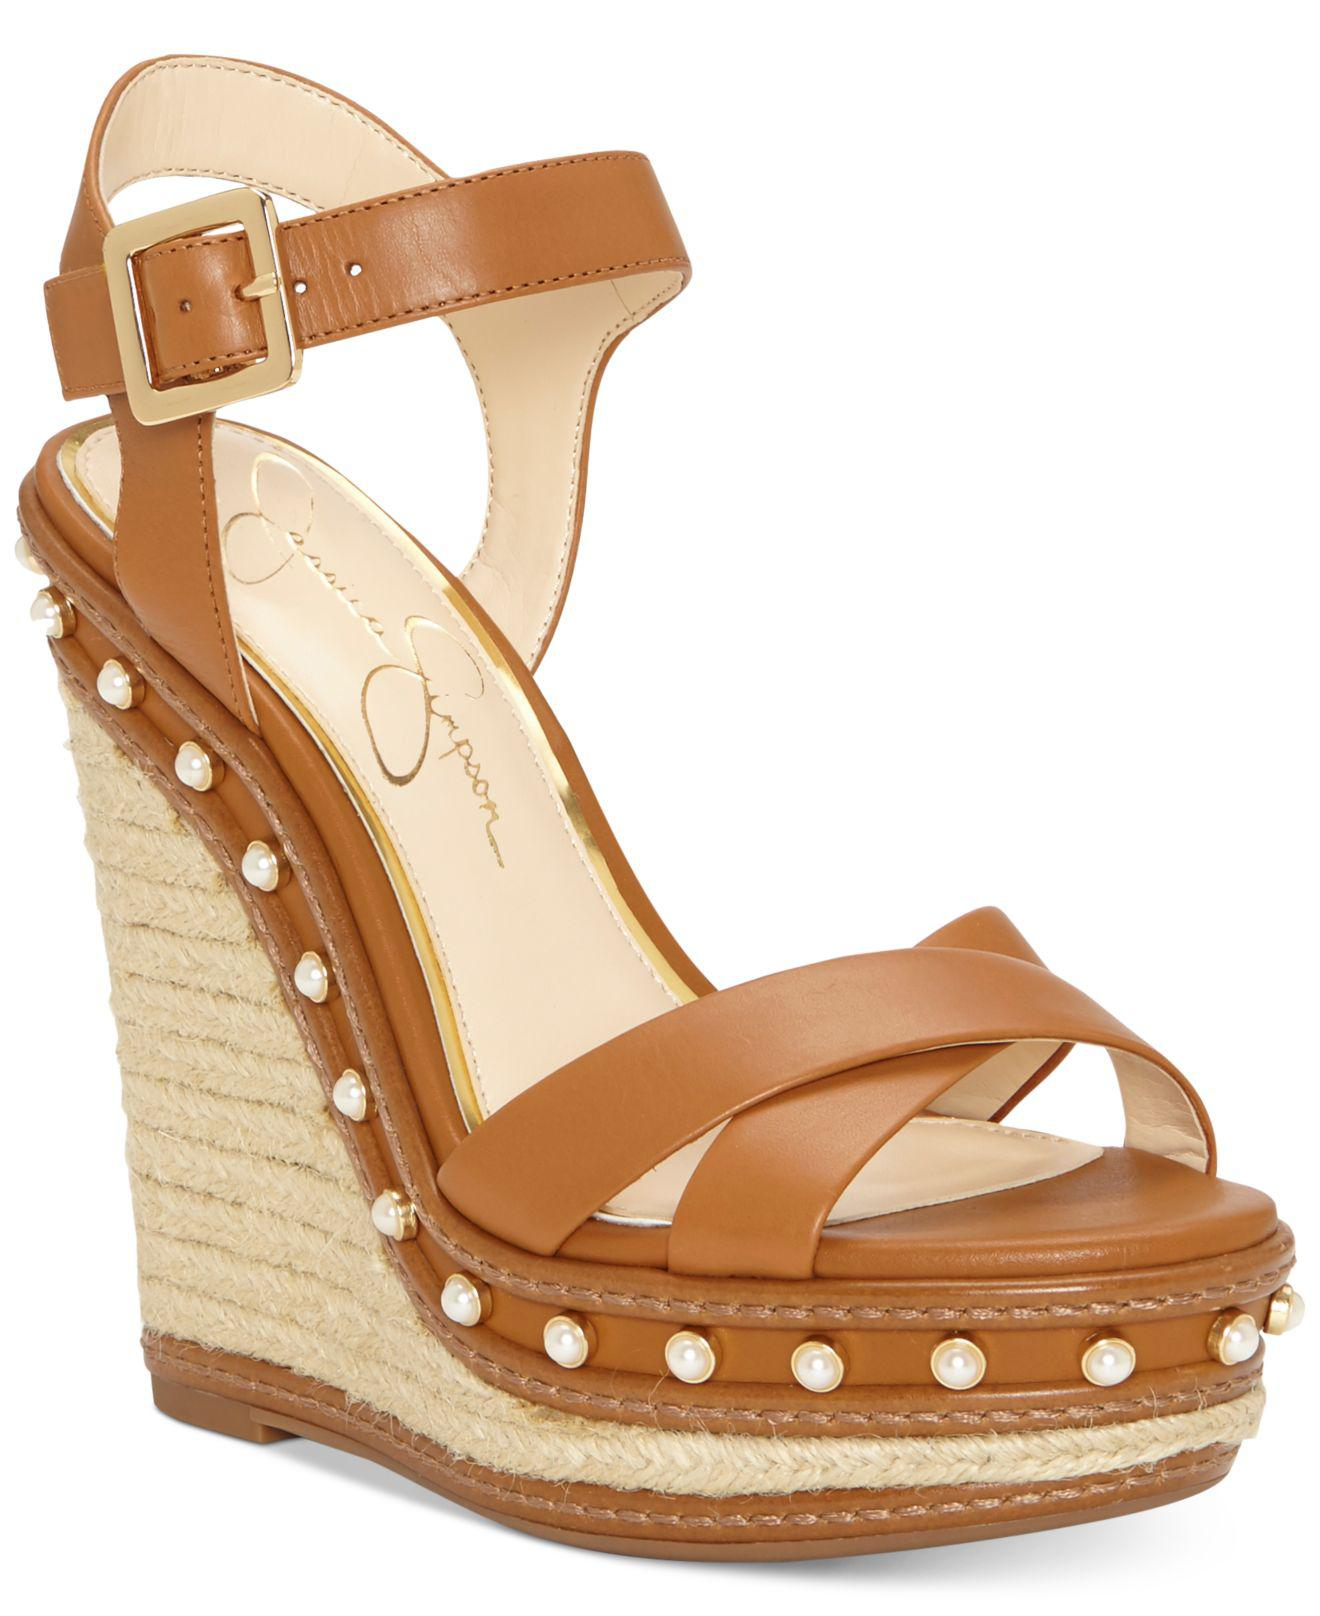 dd8d7f1dd400 Lyst - Jessica Simpson Aeralin Wedge Sandals in Brown